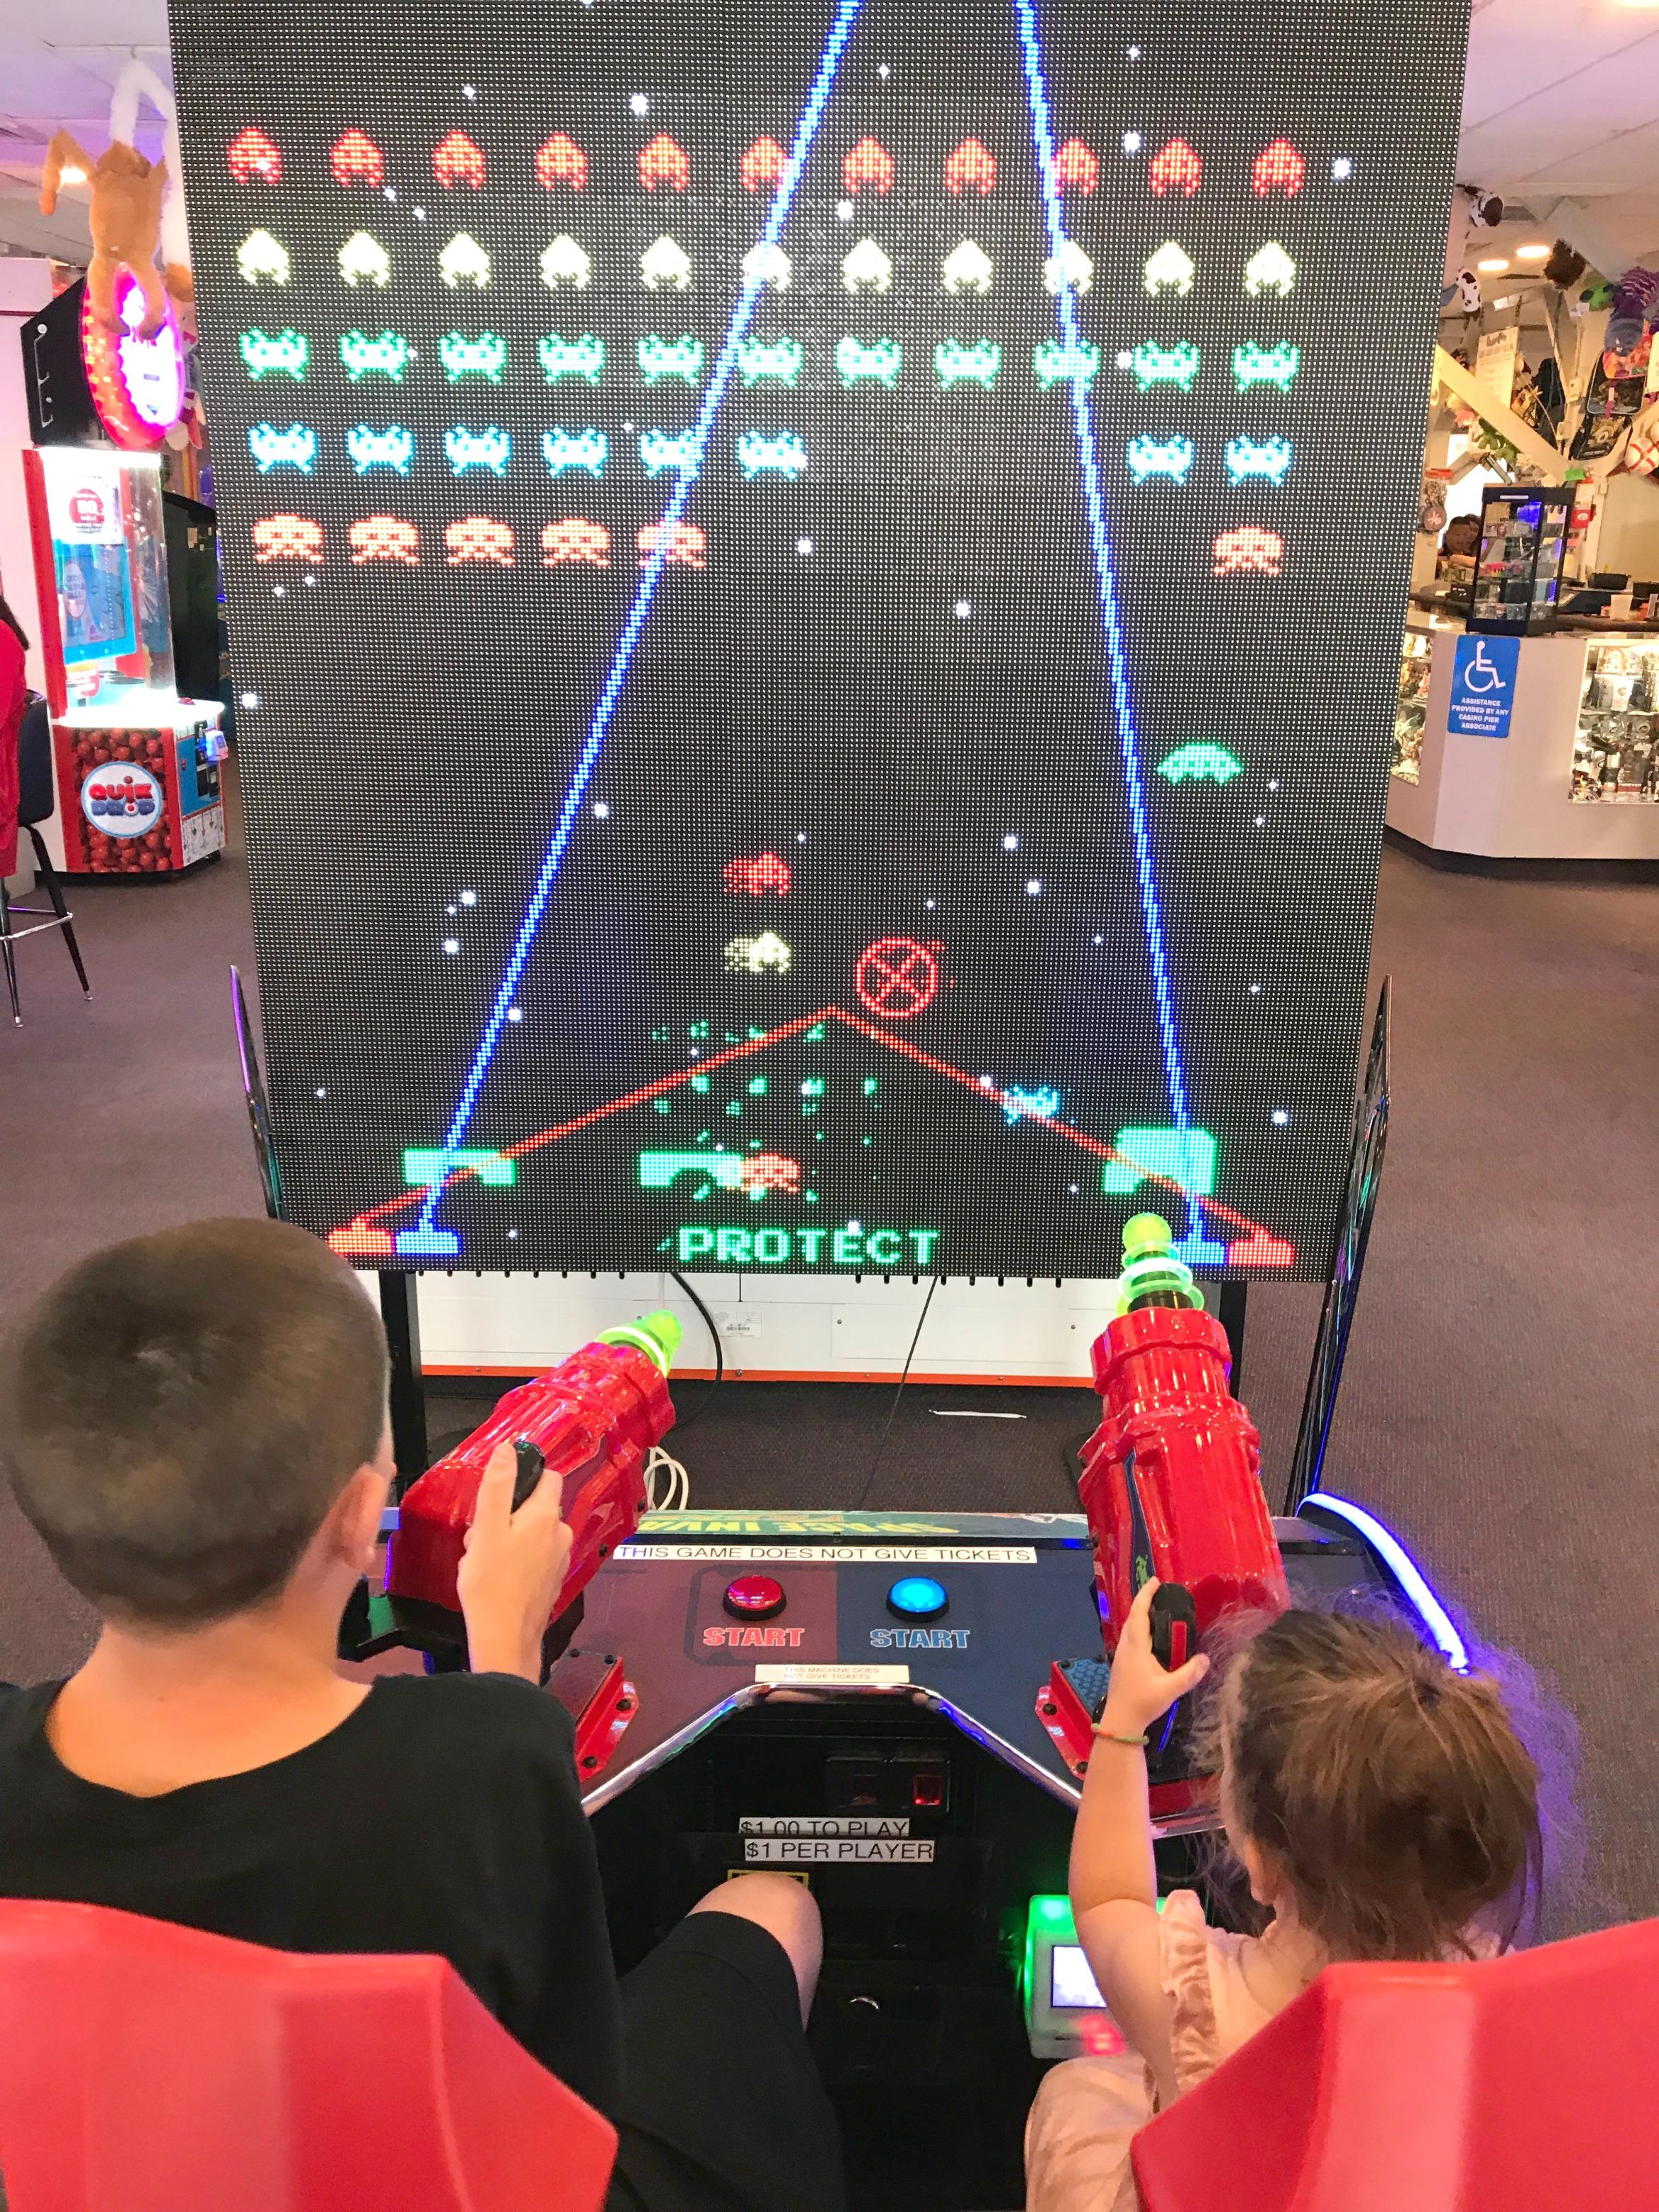 Arcade Games in Casino Pier